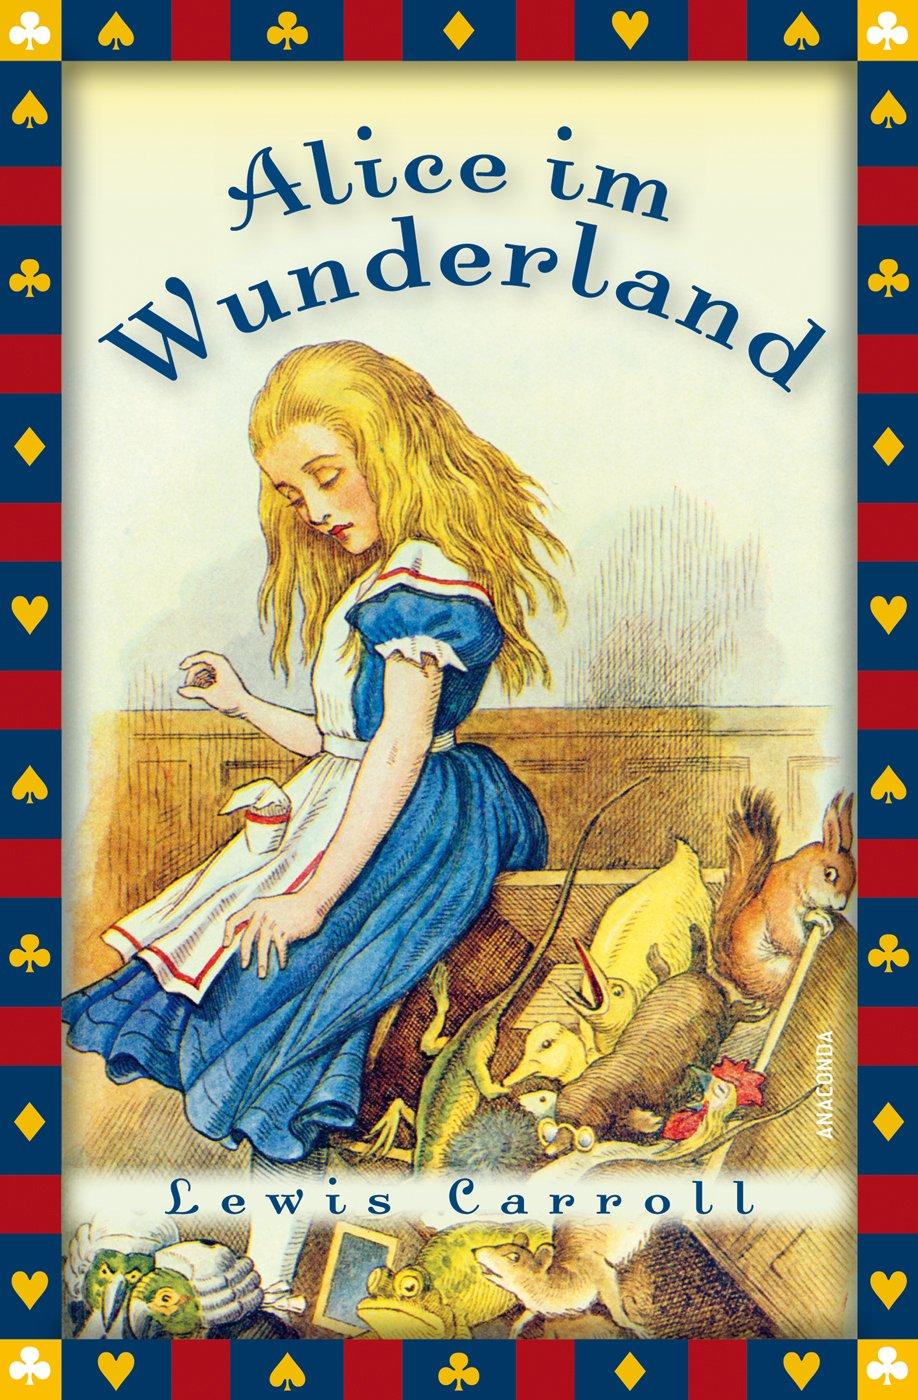 Alice im Wunderland (Lewis Carroll)